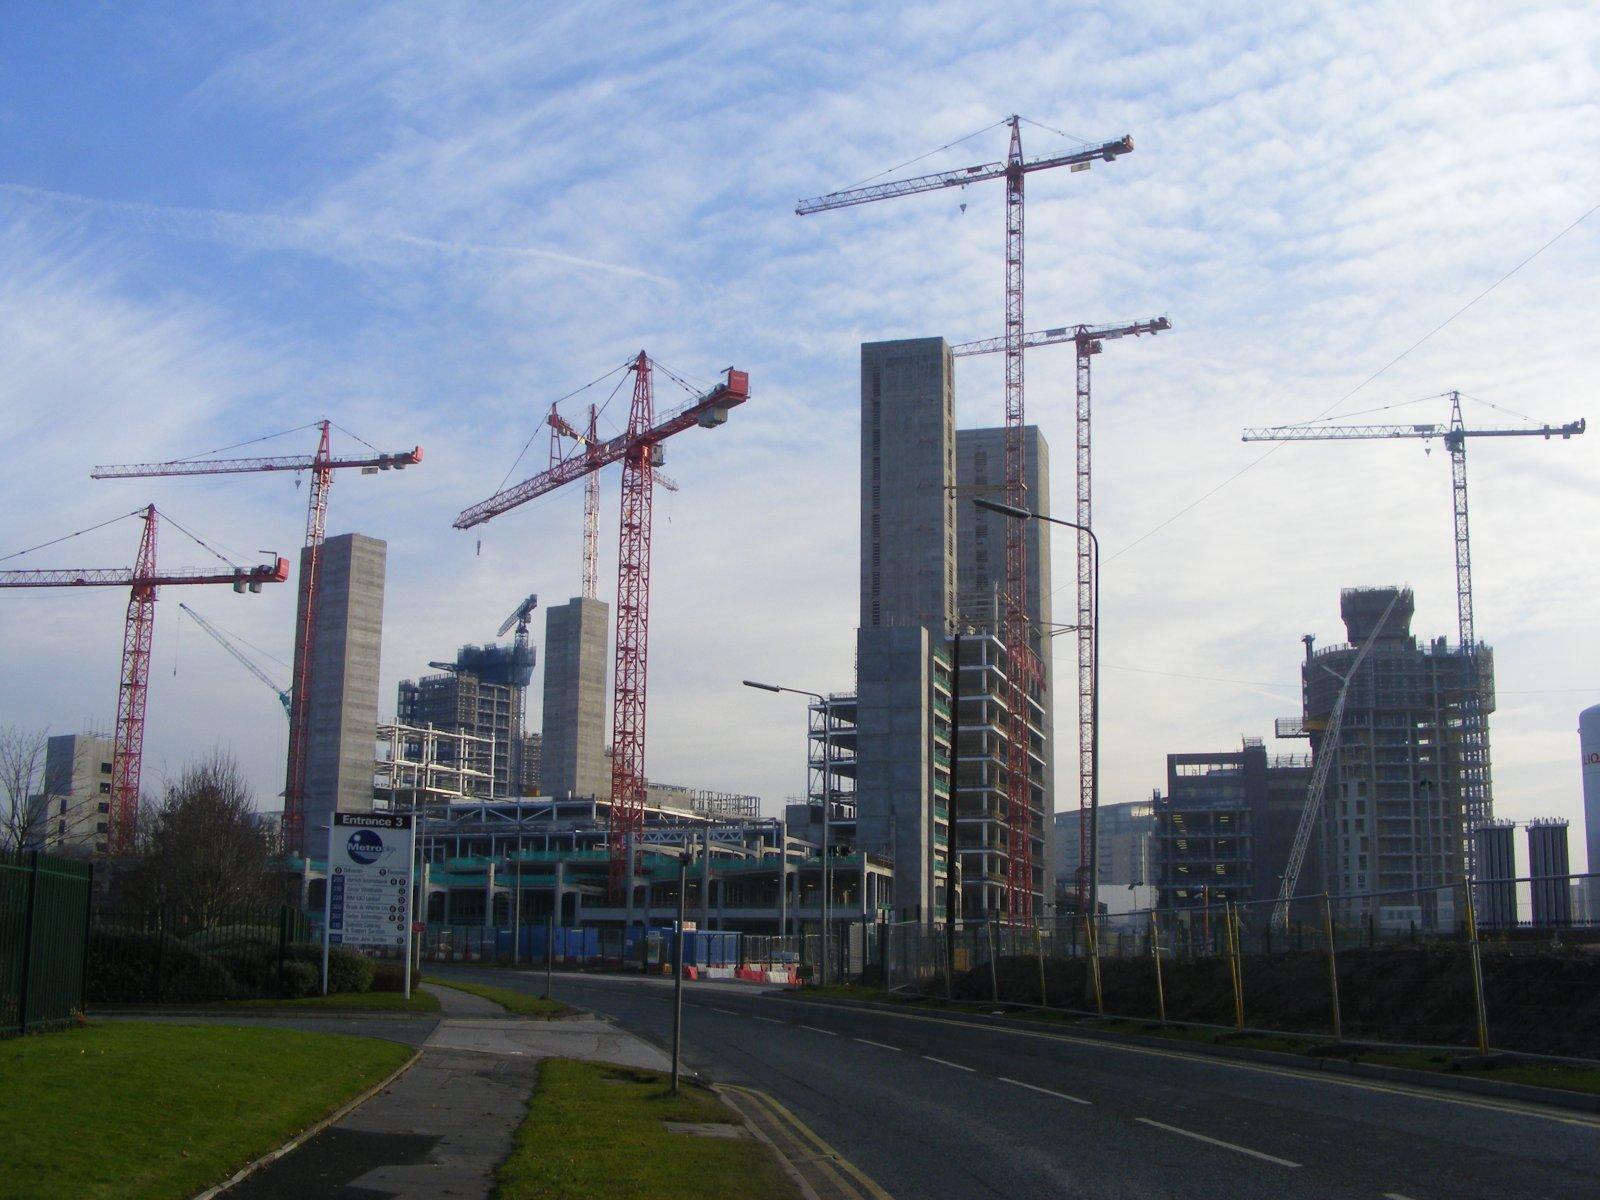 FileMedia City Cranesjpg Wikimedia Commons